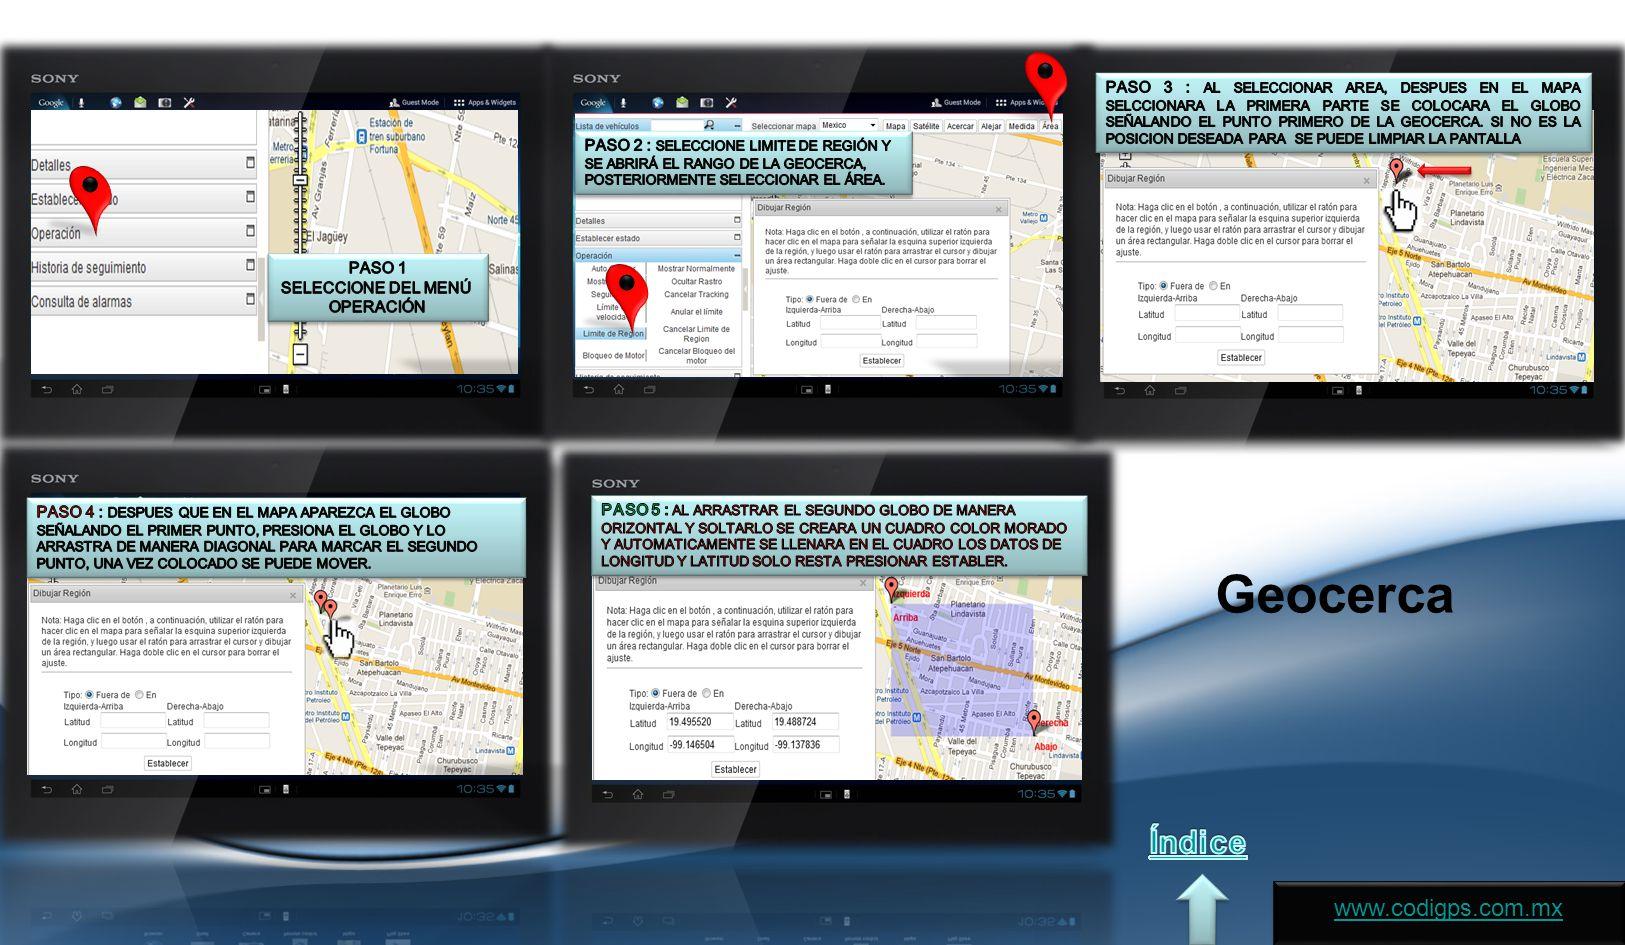 Geocerca www.codigps.com.mx